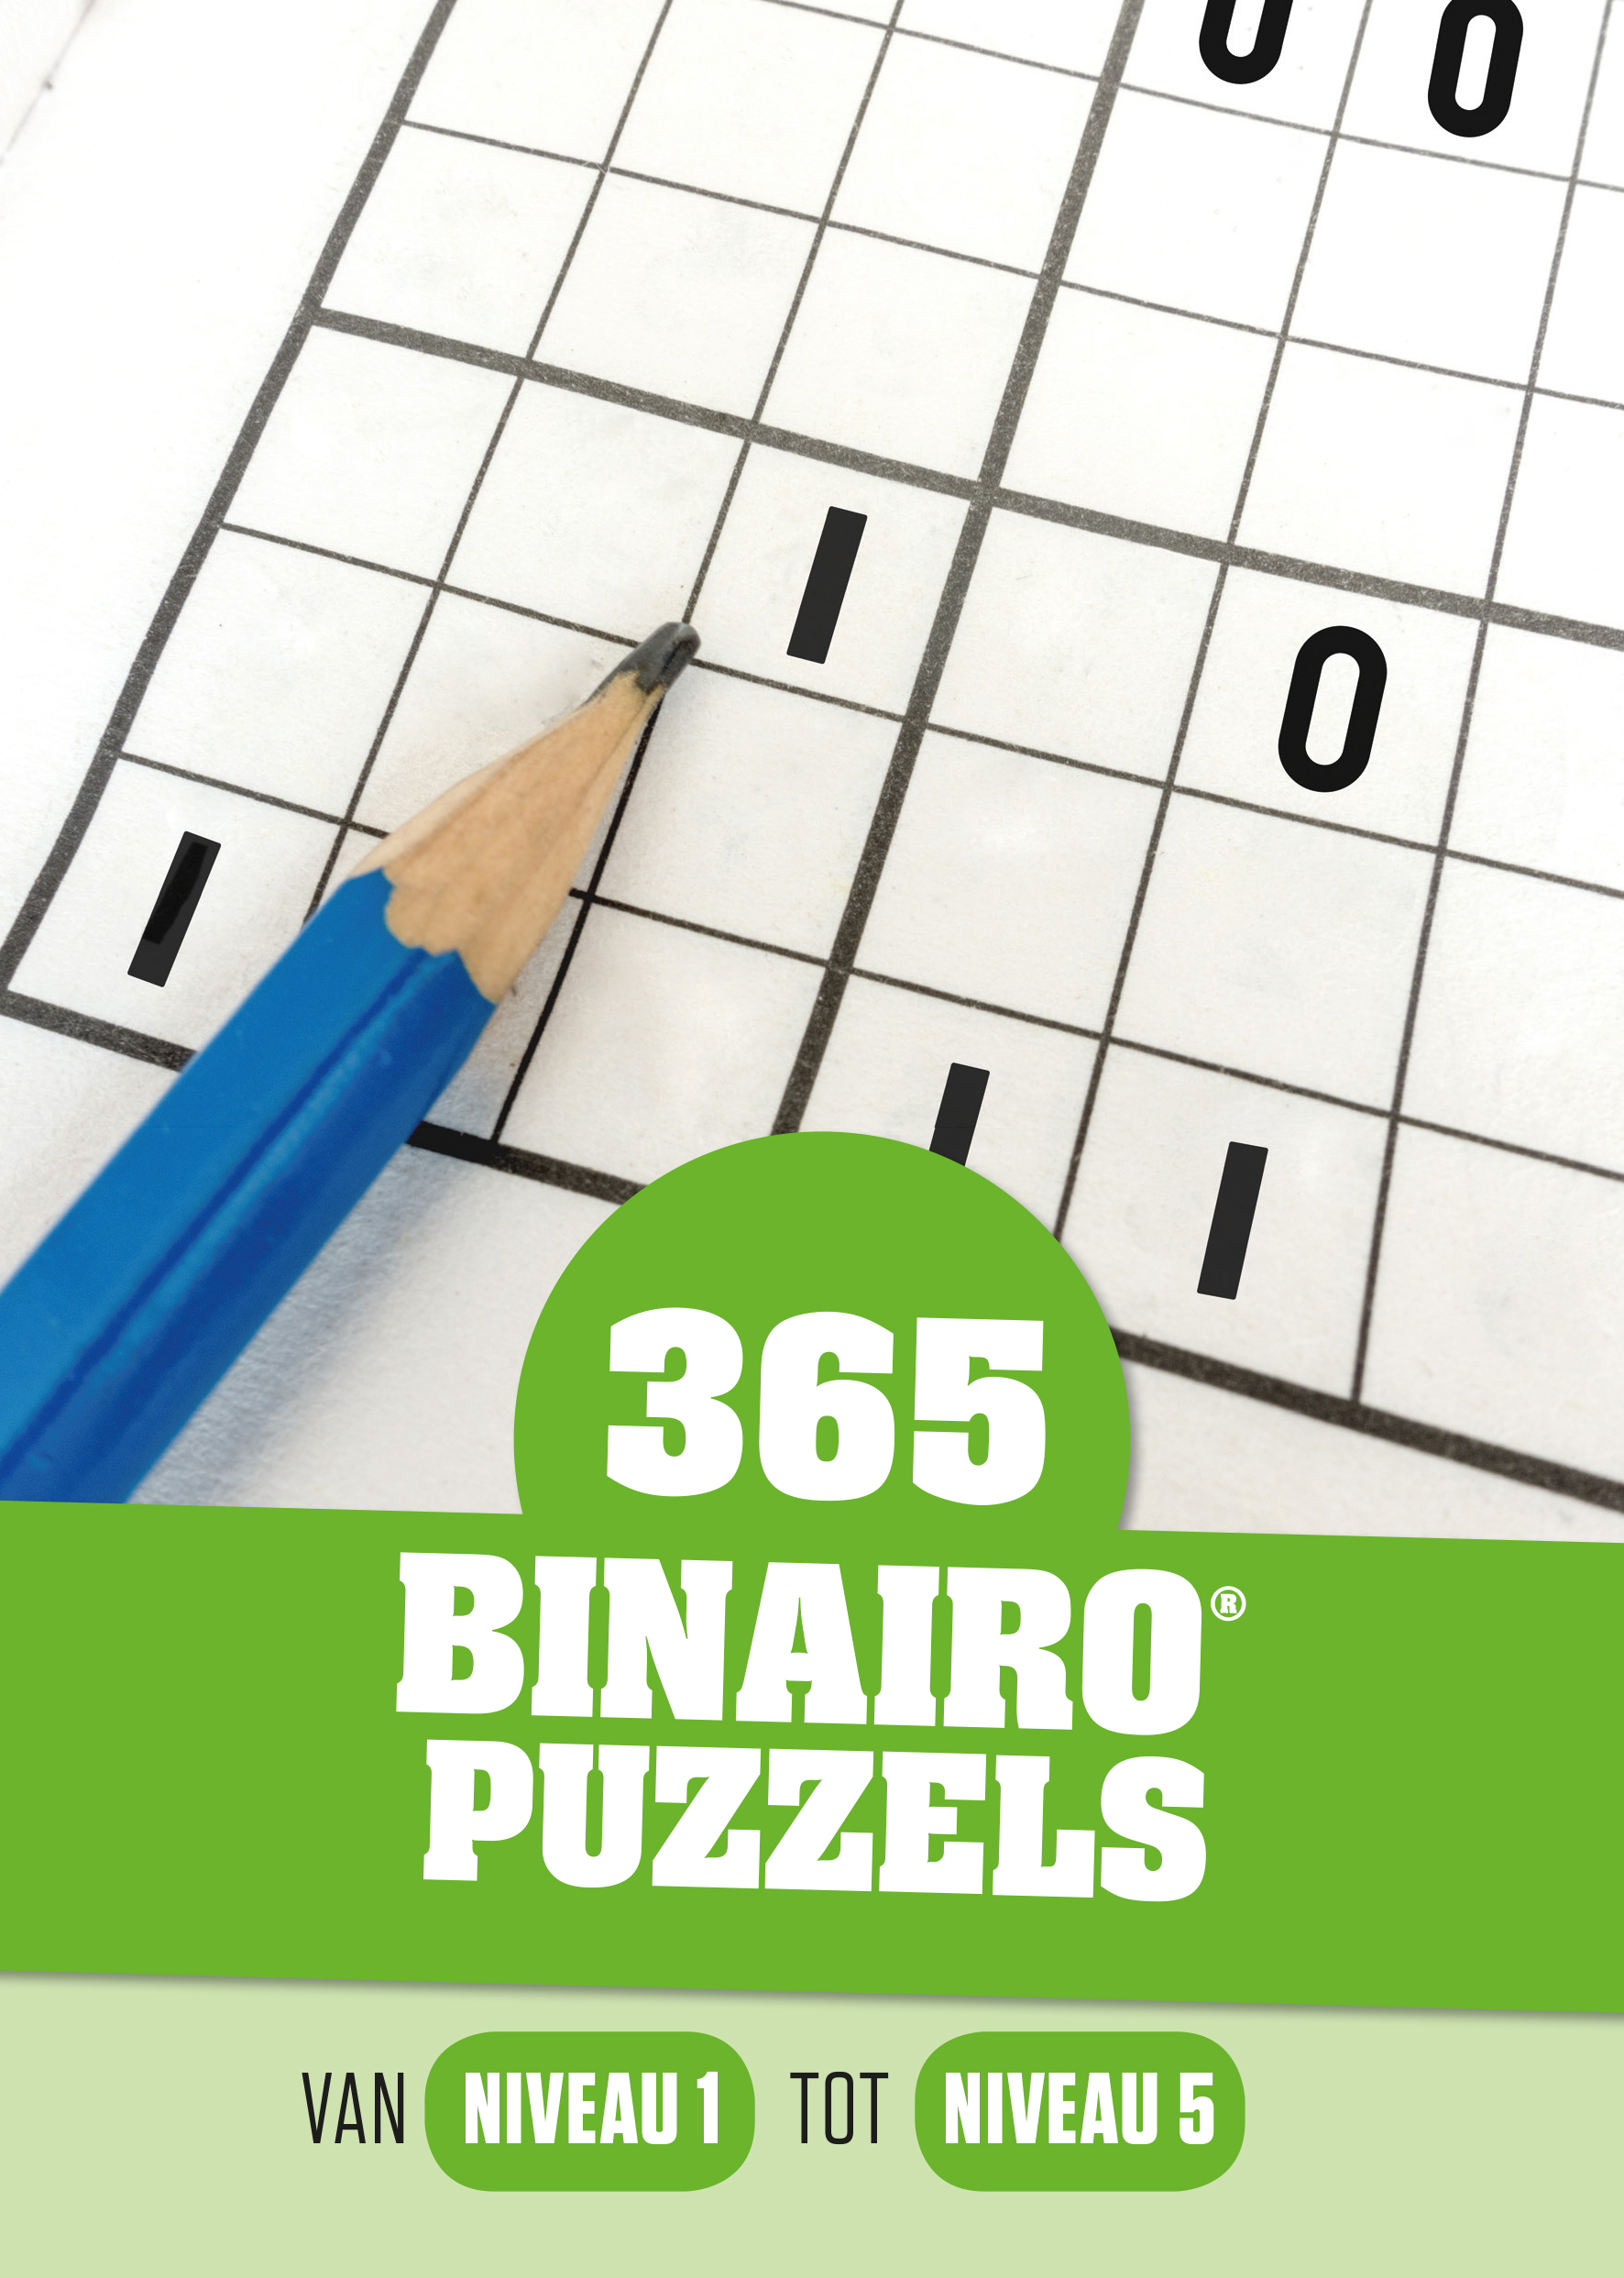 365 BINAIRO PUZZELS COVER